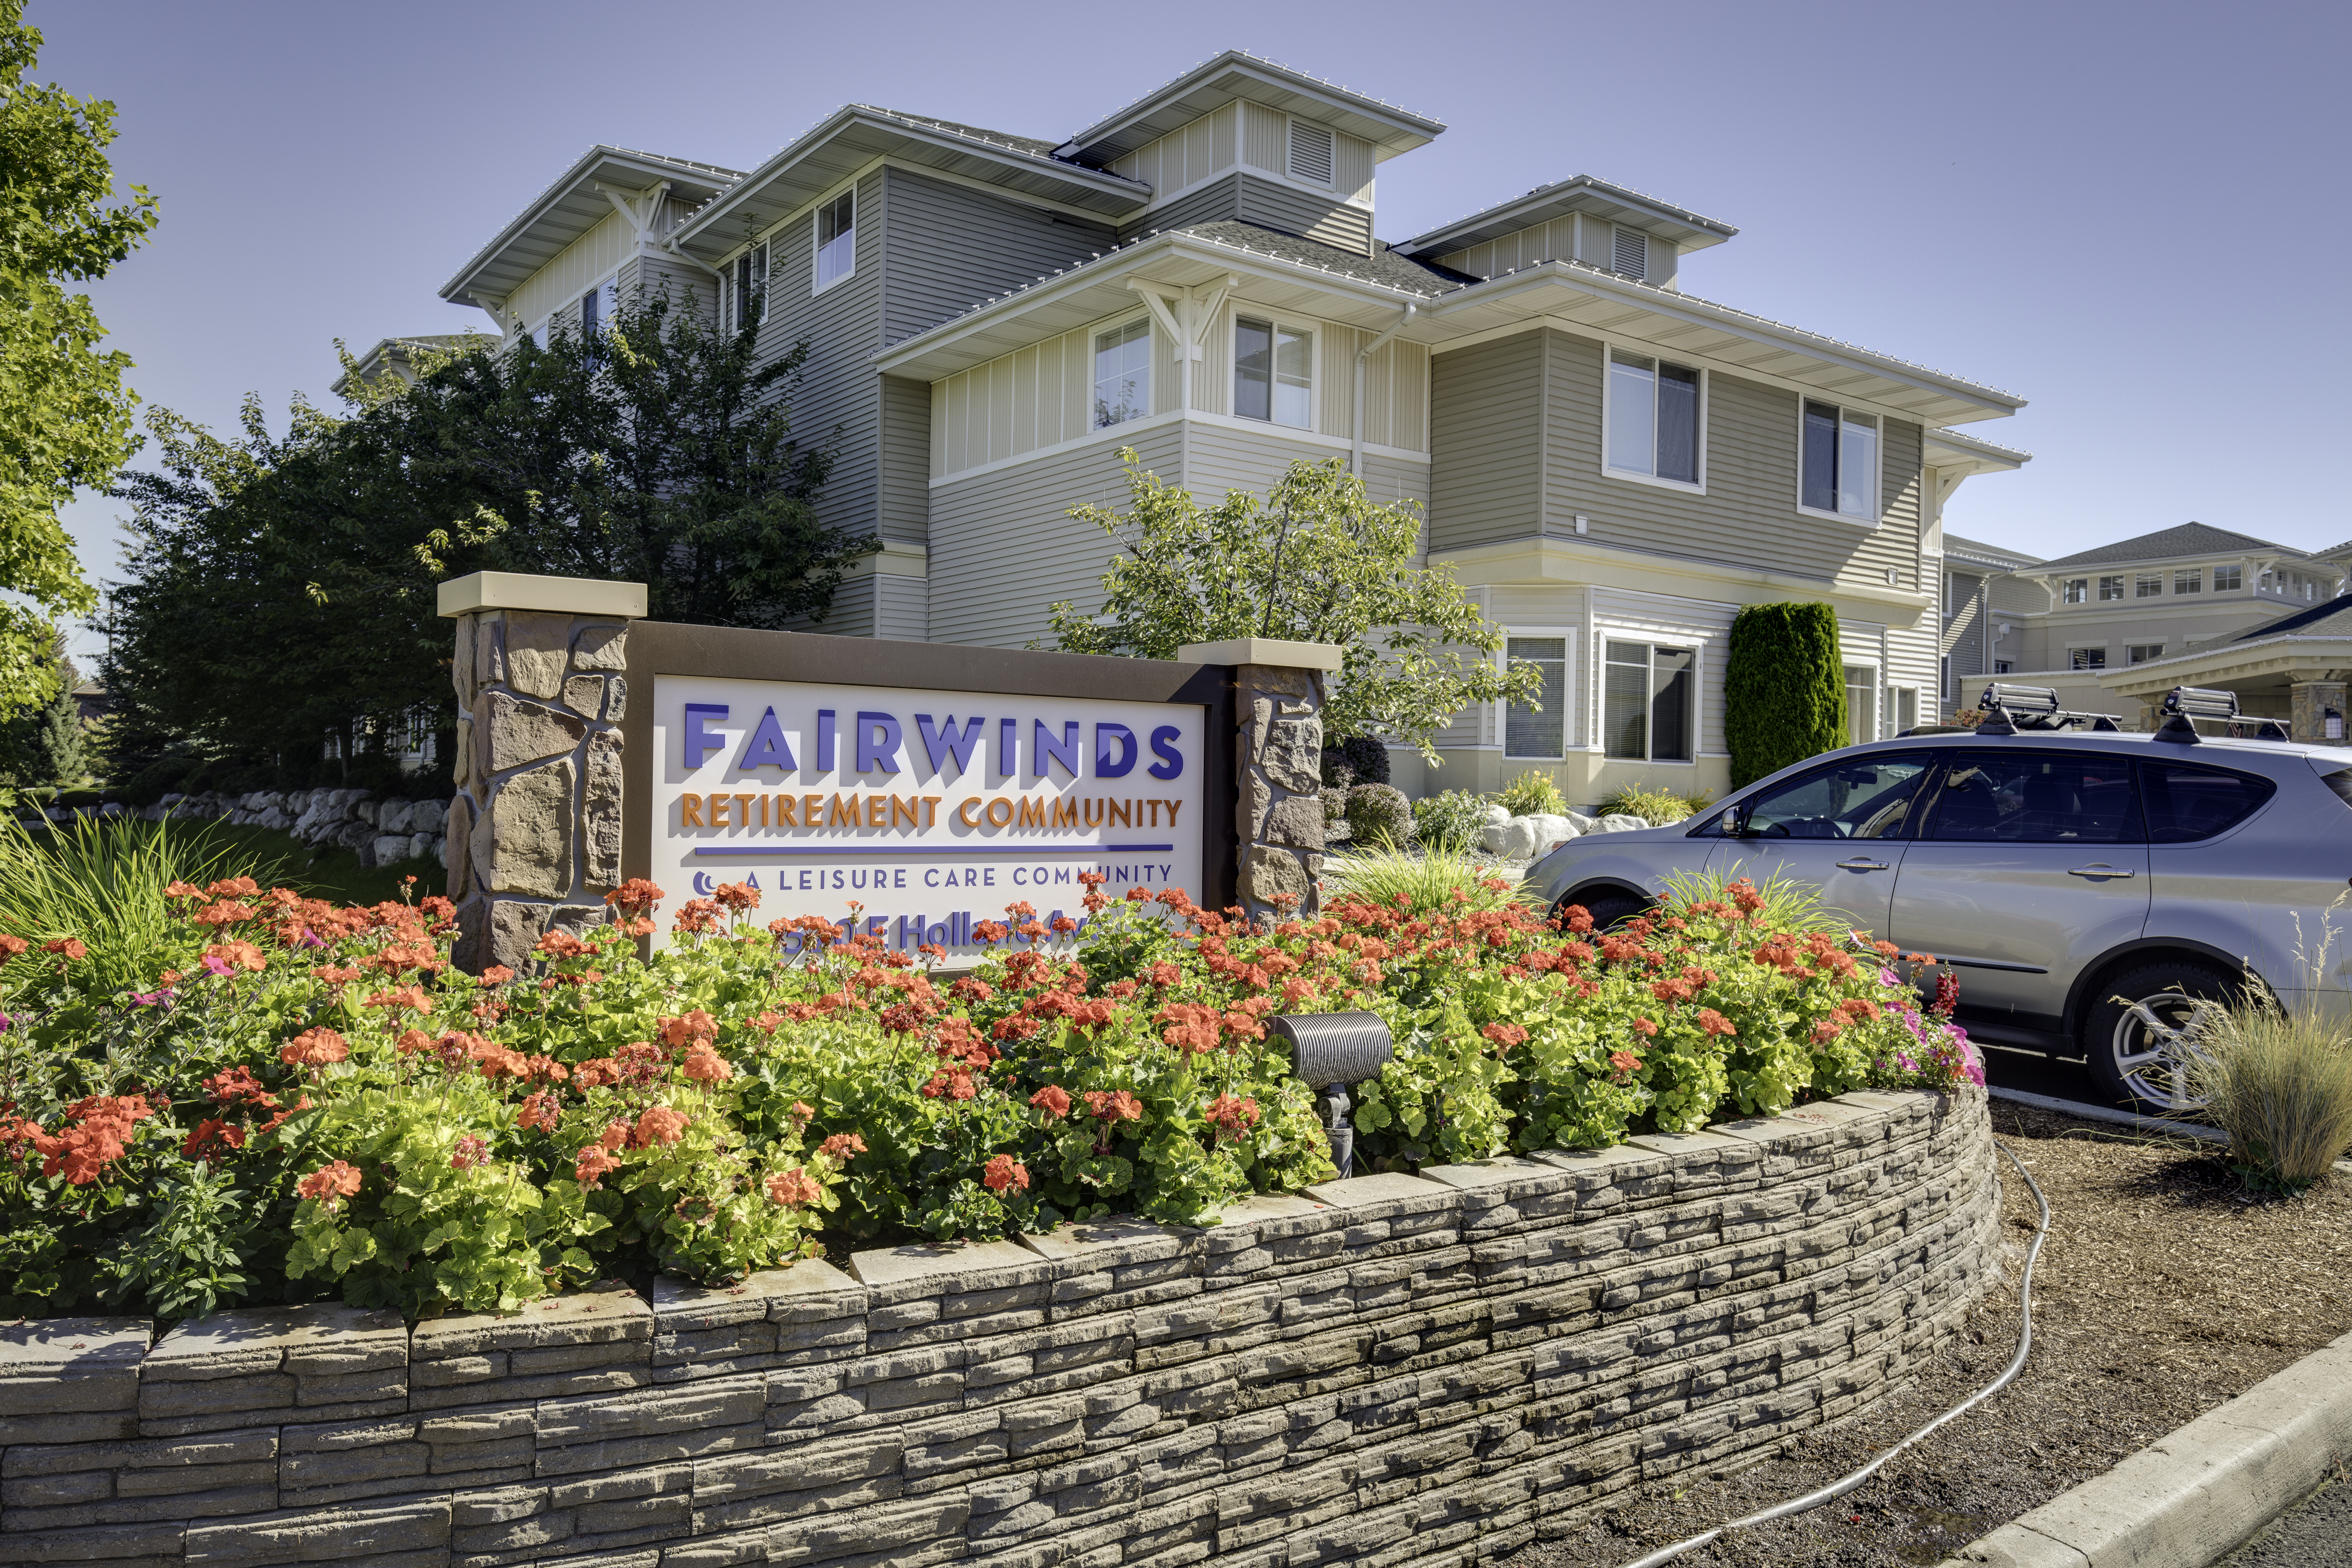 Fairwinds Customer Service >> Senior Living In Spokane Wa Fairwinds Retirement Community